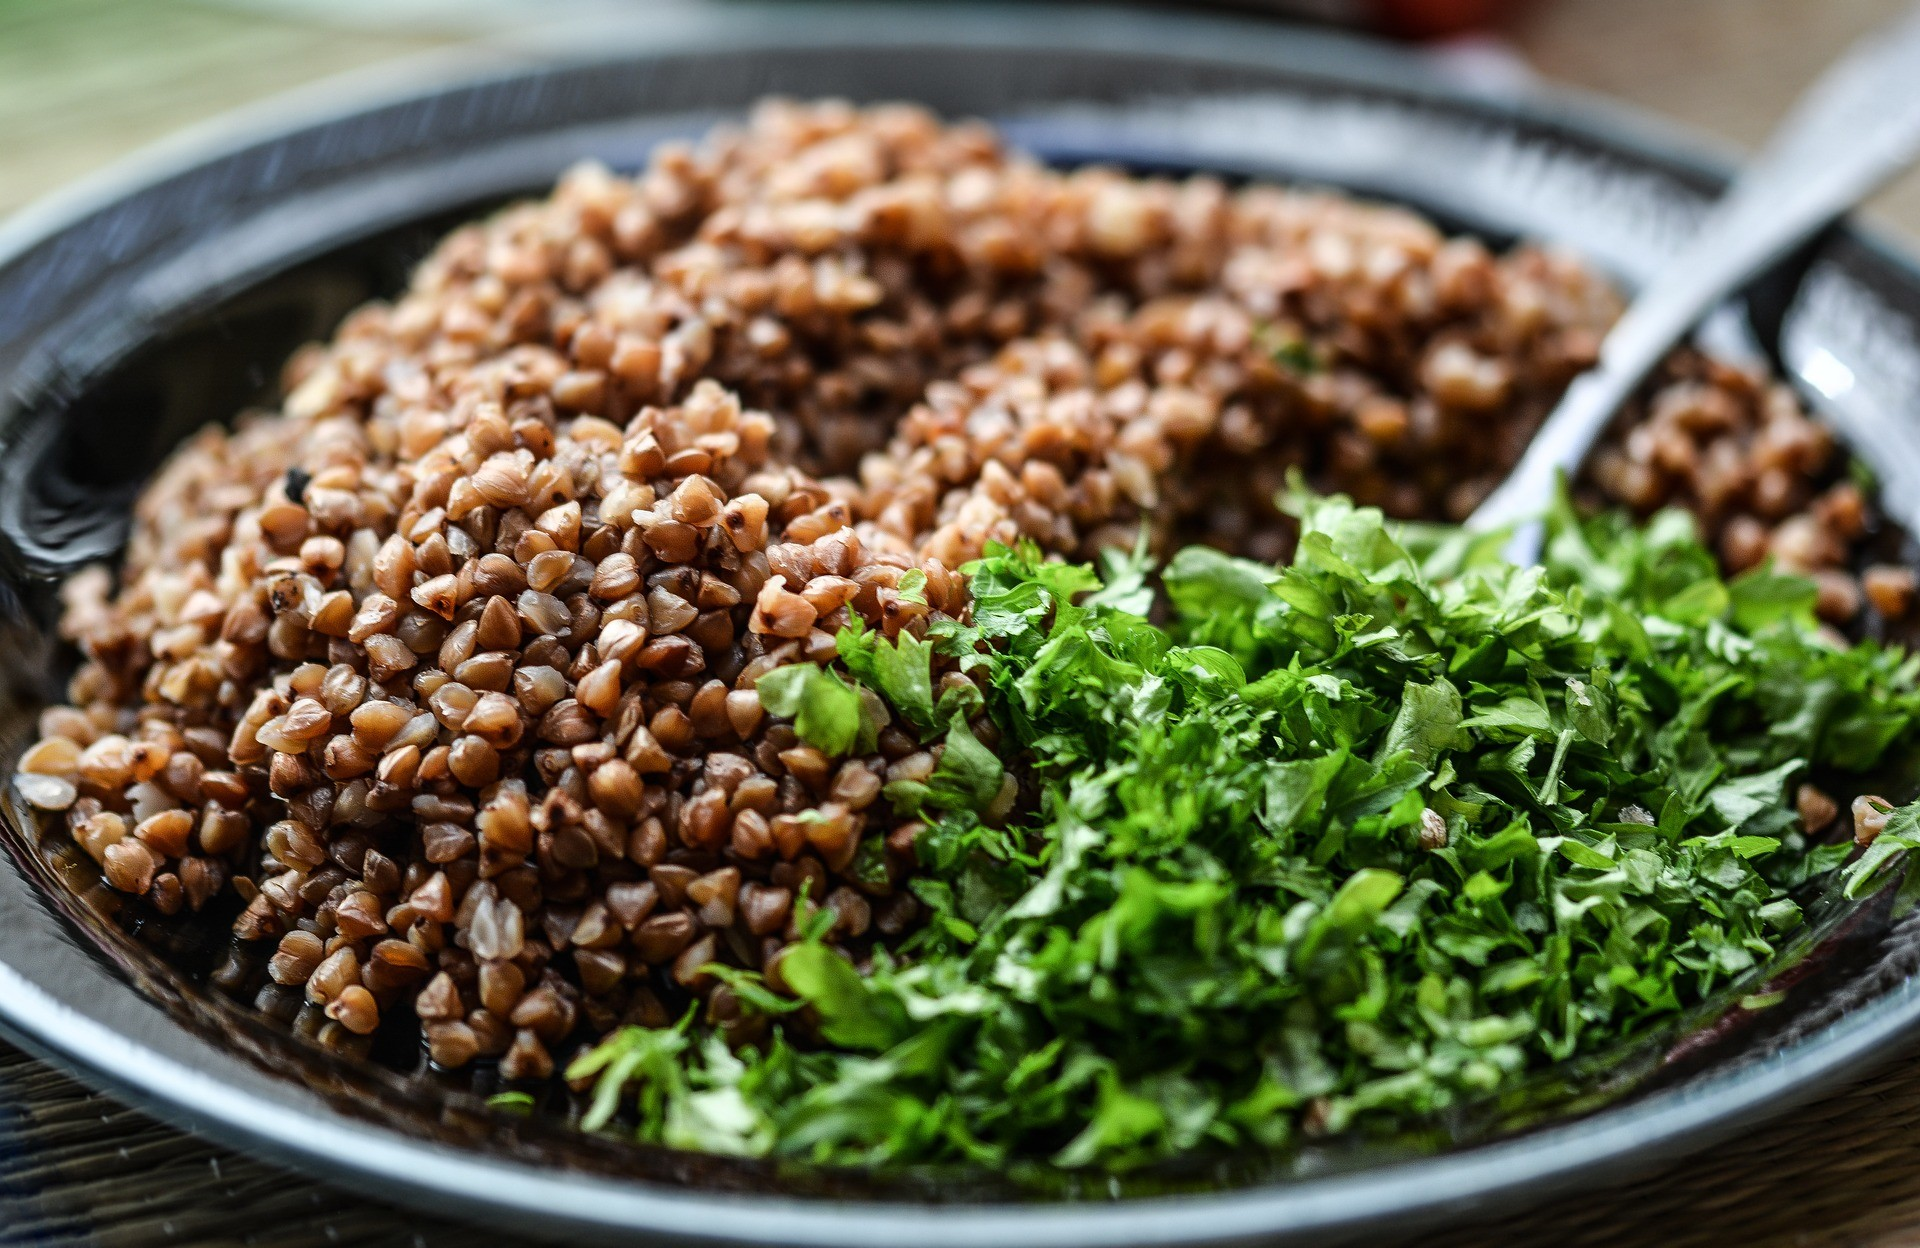 "<p>Фото &copy; Pixabay/<a href=""https://pixabay.com/en/groats-meal-herbs-food-vegetarian-1459940/"">monicore</a></p>"